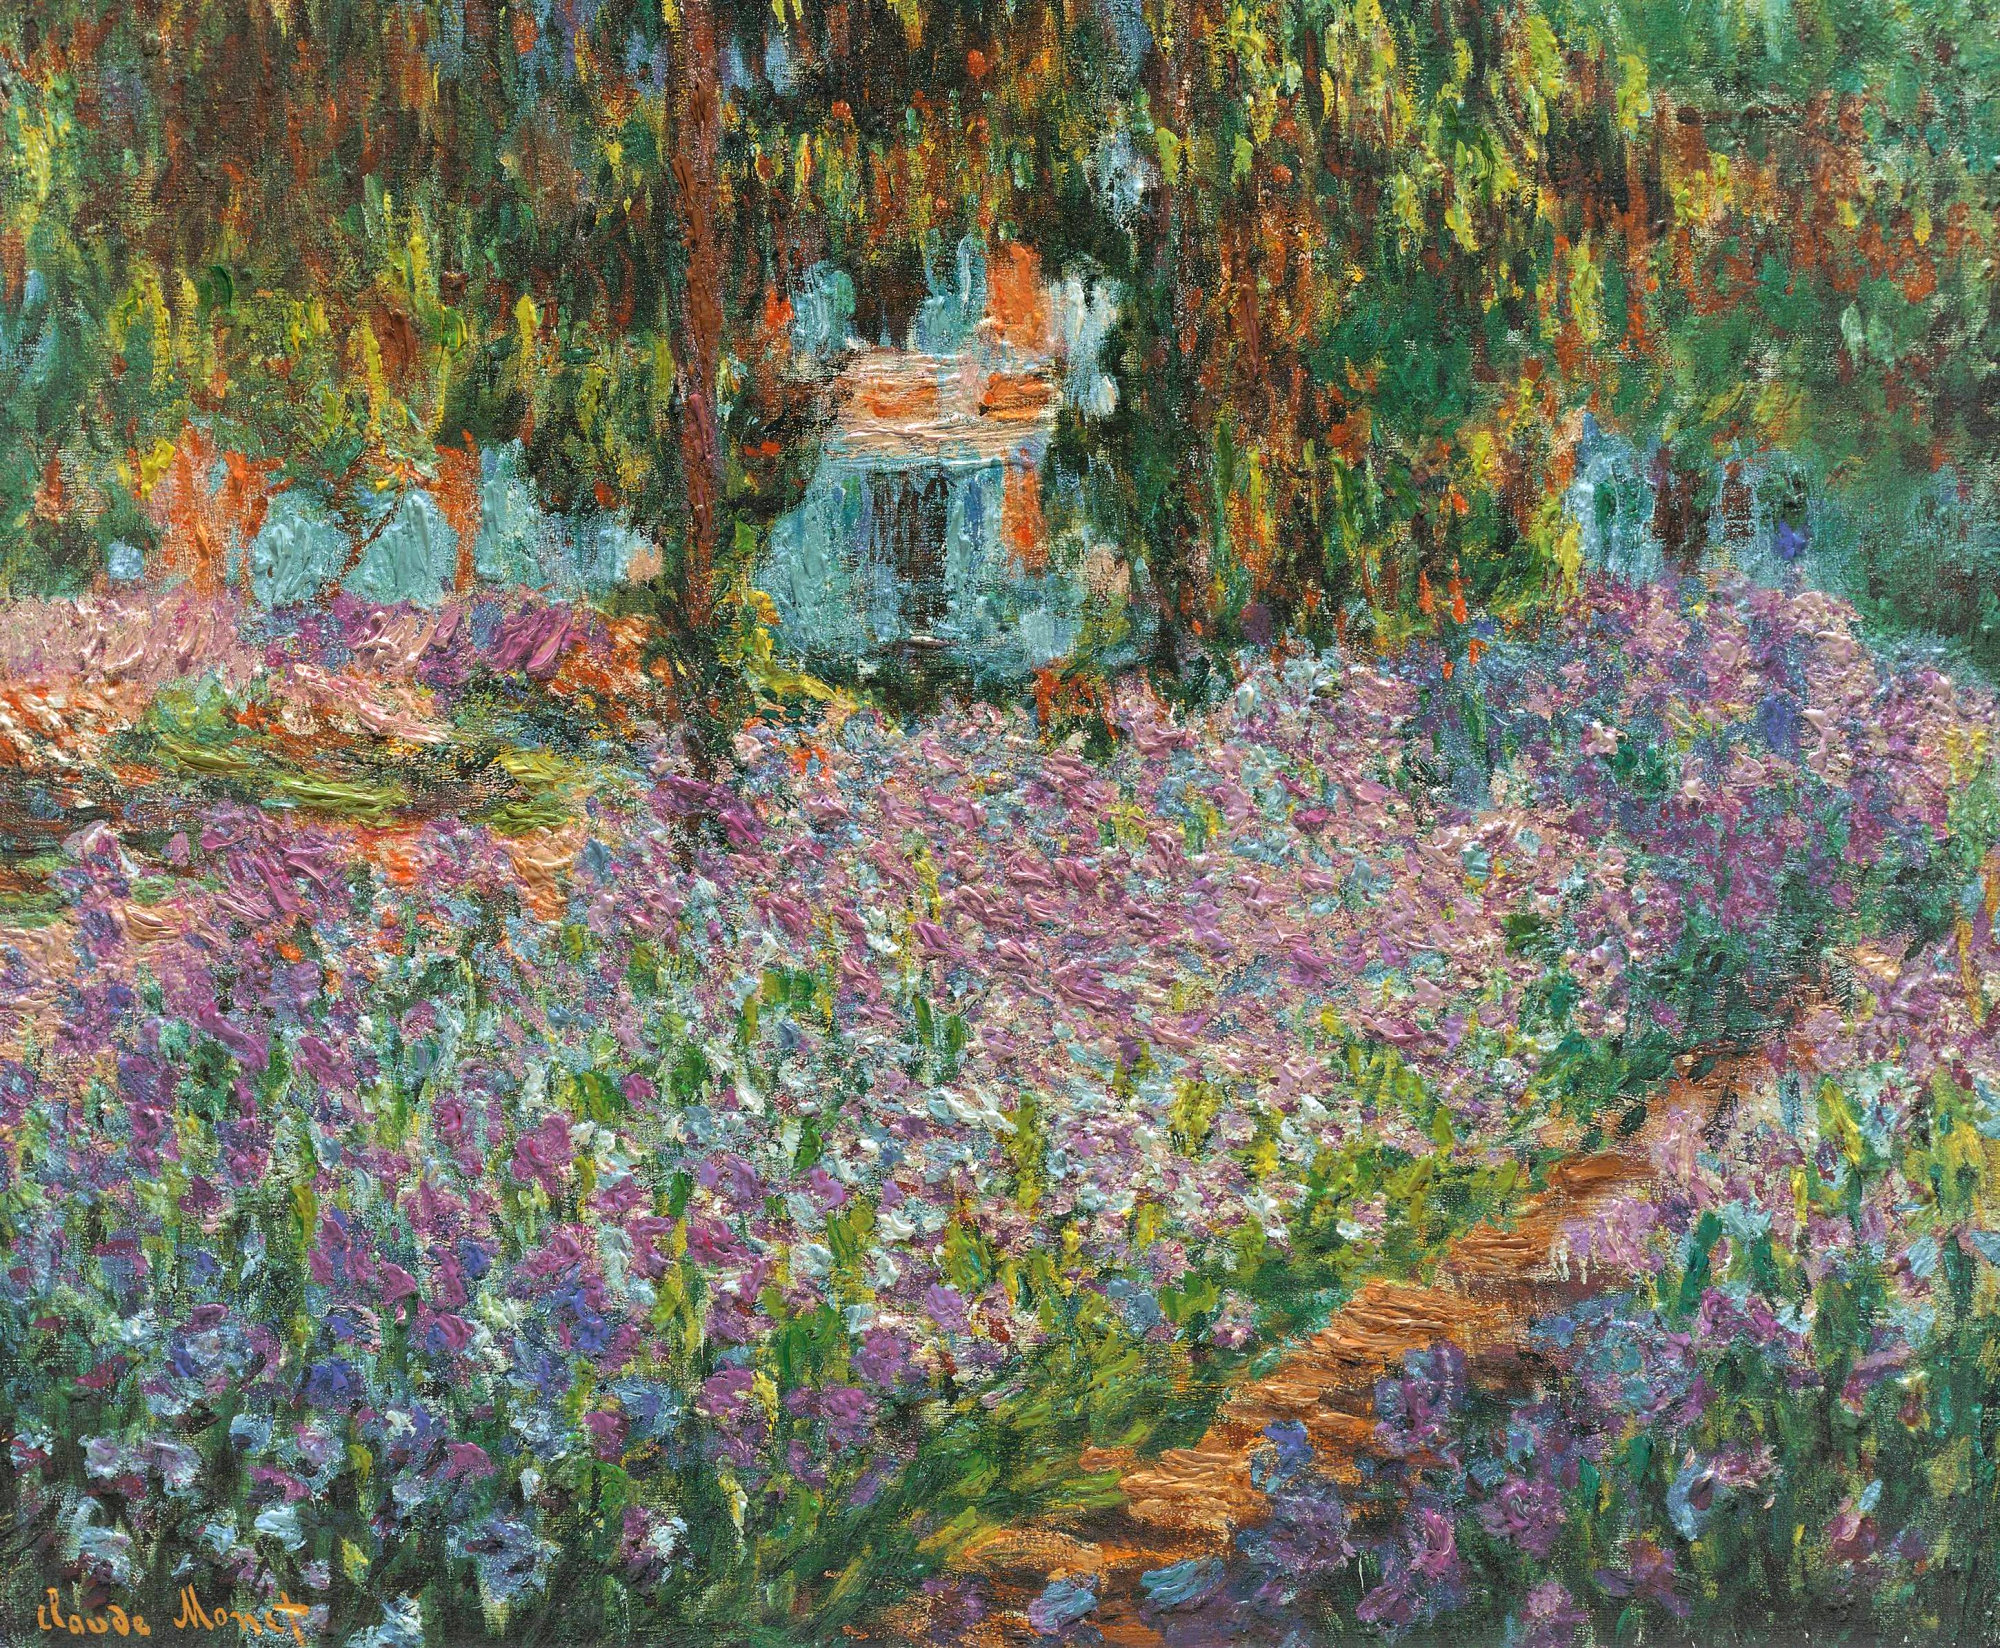 Irises in monet 39 s garden 1900 claude monet for Claude monet artwork